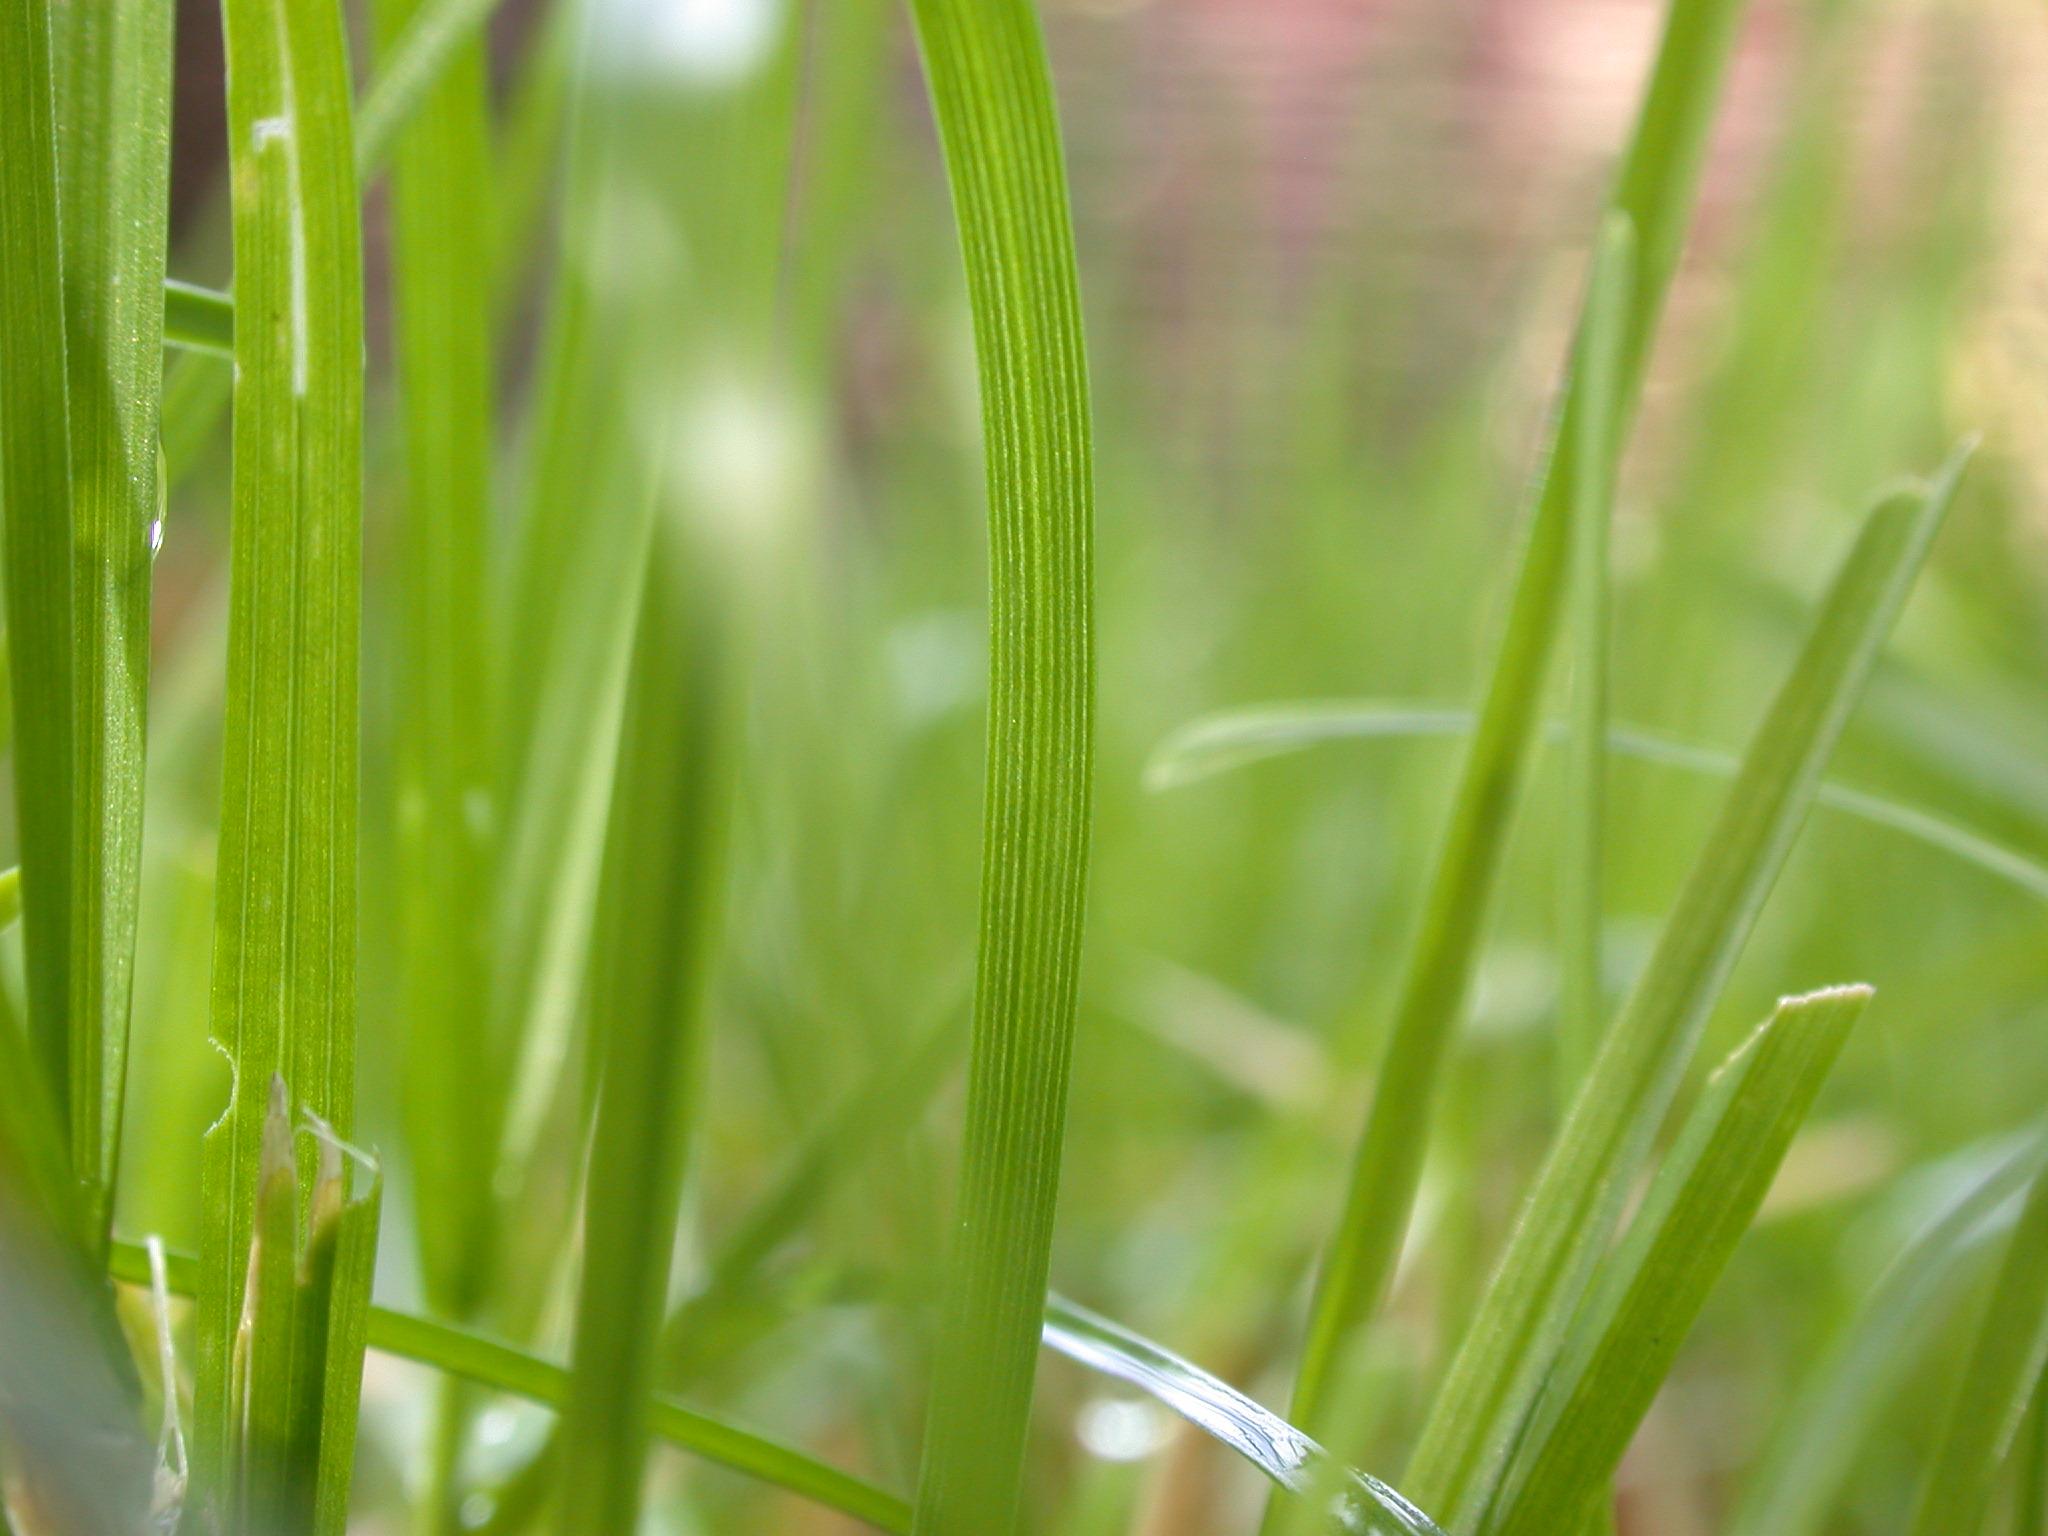 marceladmiraal blade blades of grass green closeup royalty free